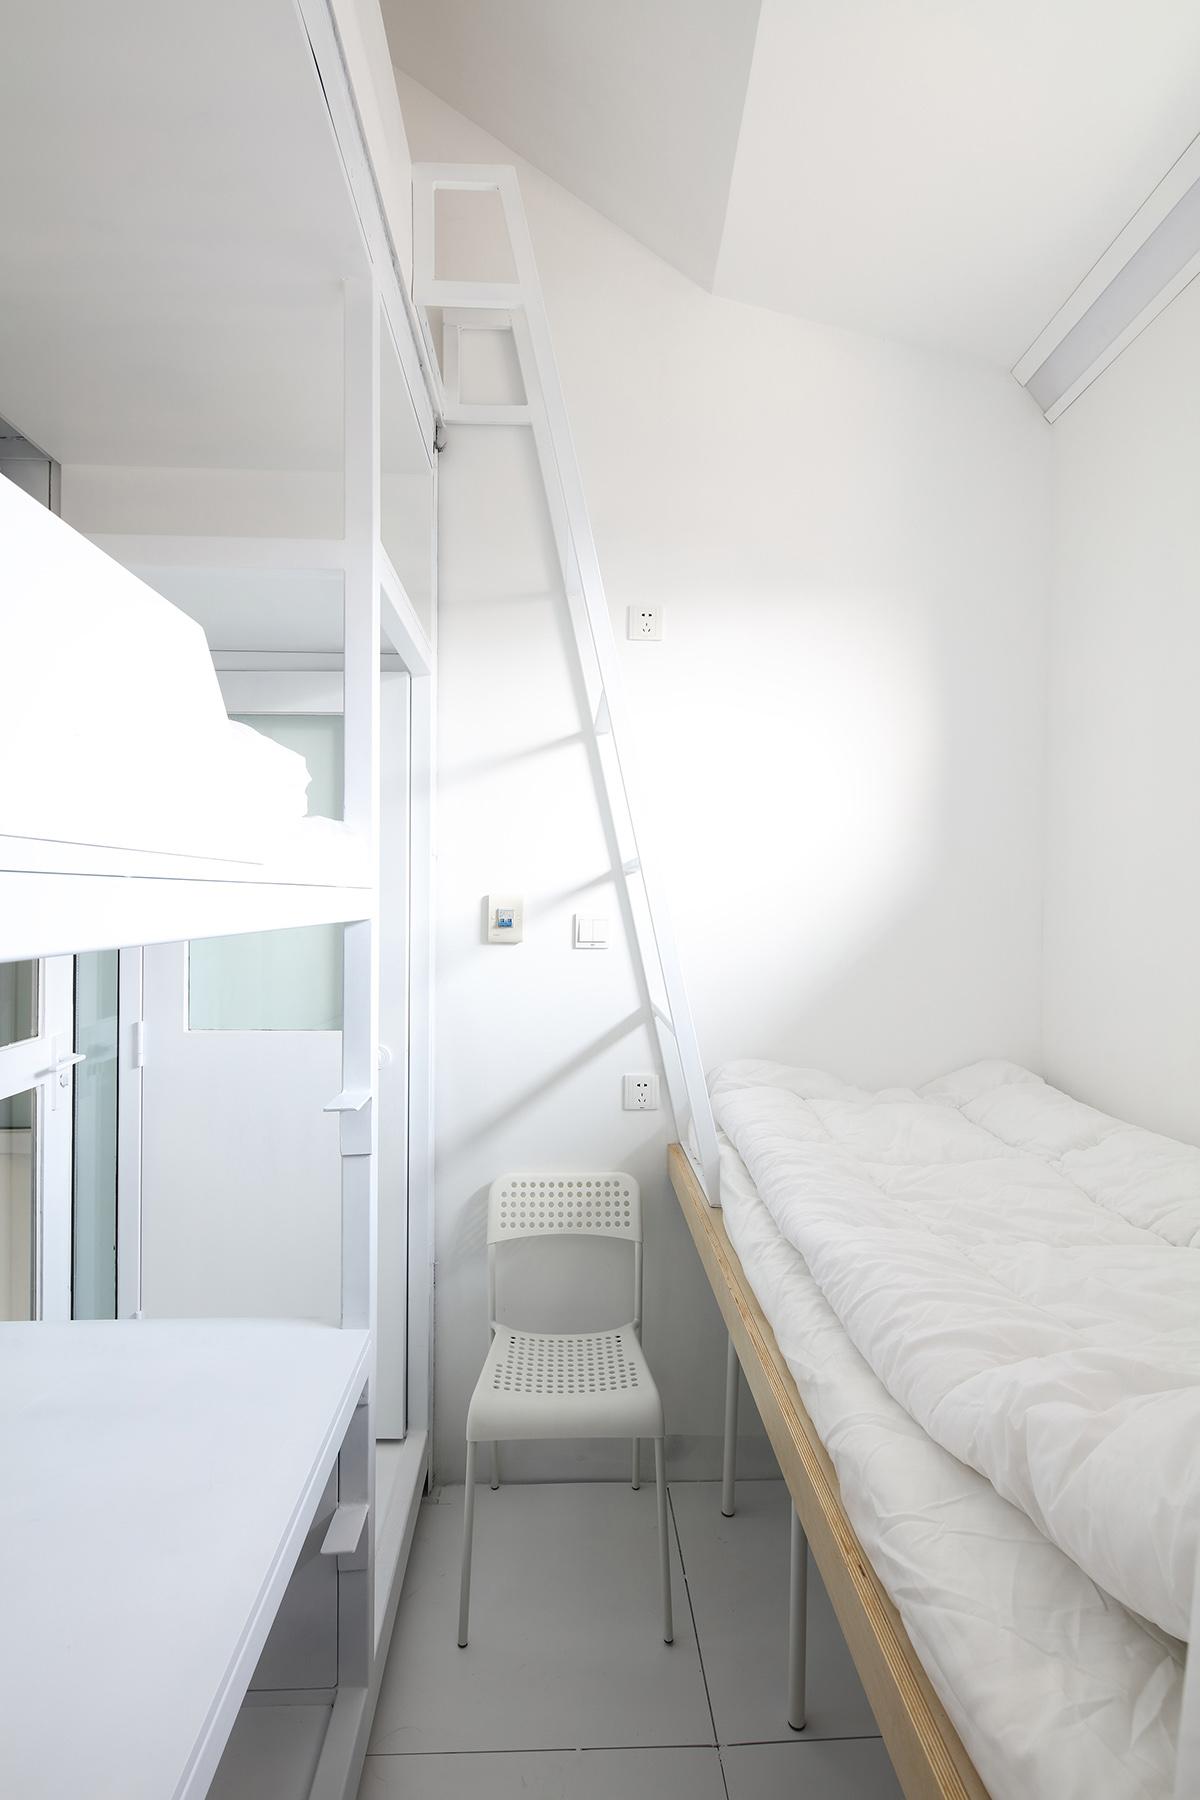 Caopu-humble-hostel-hisheji (16)